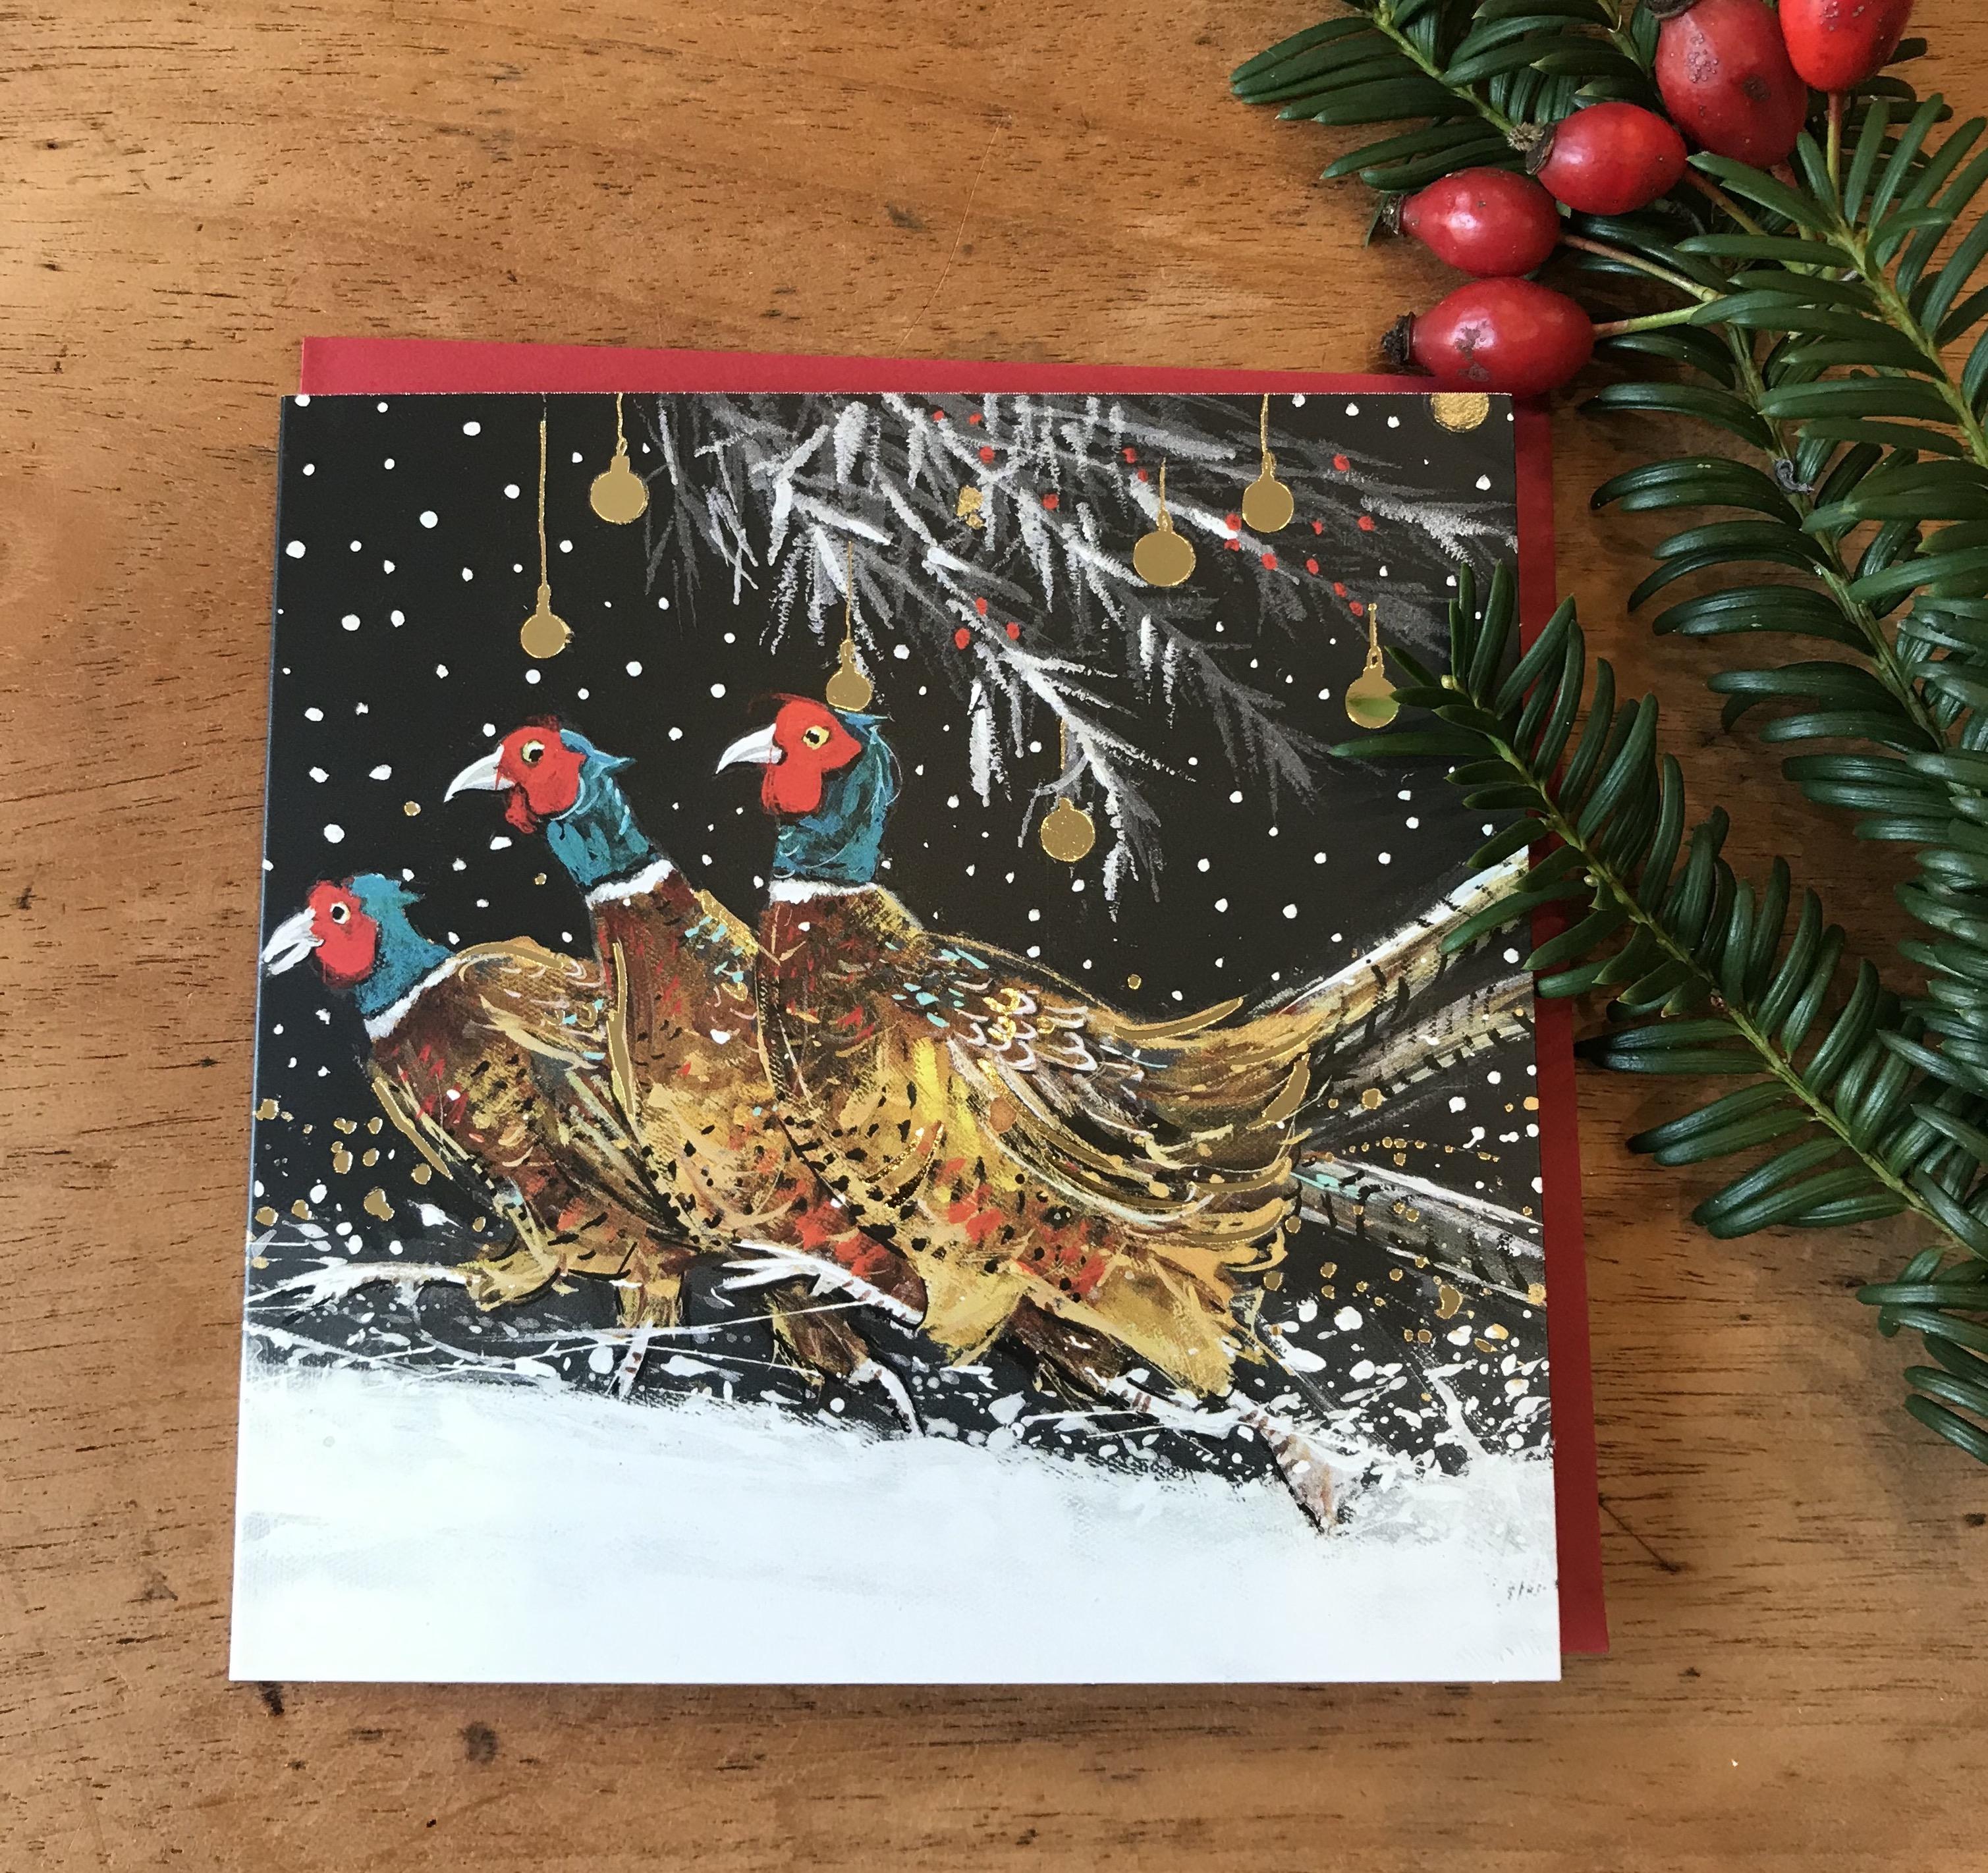 'Christmas Pheasants' Charity Christmas Card Pack - was £4.50